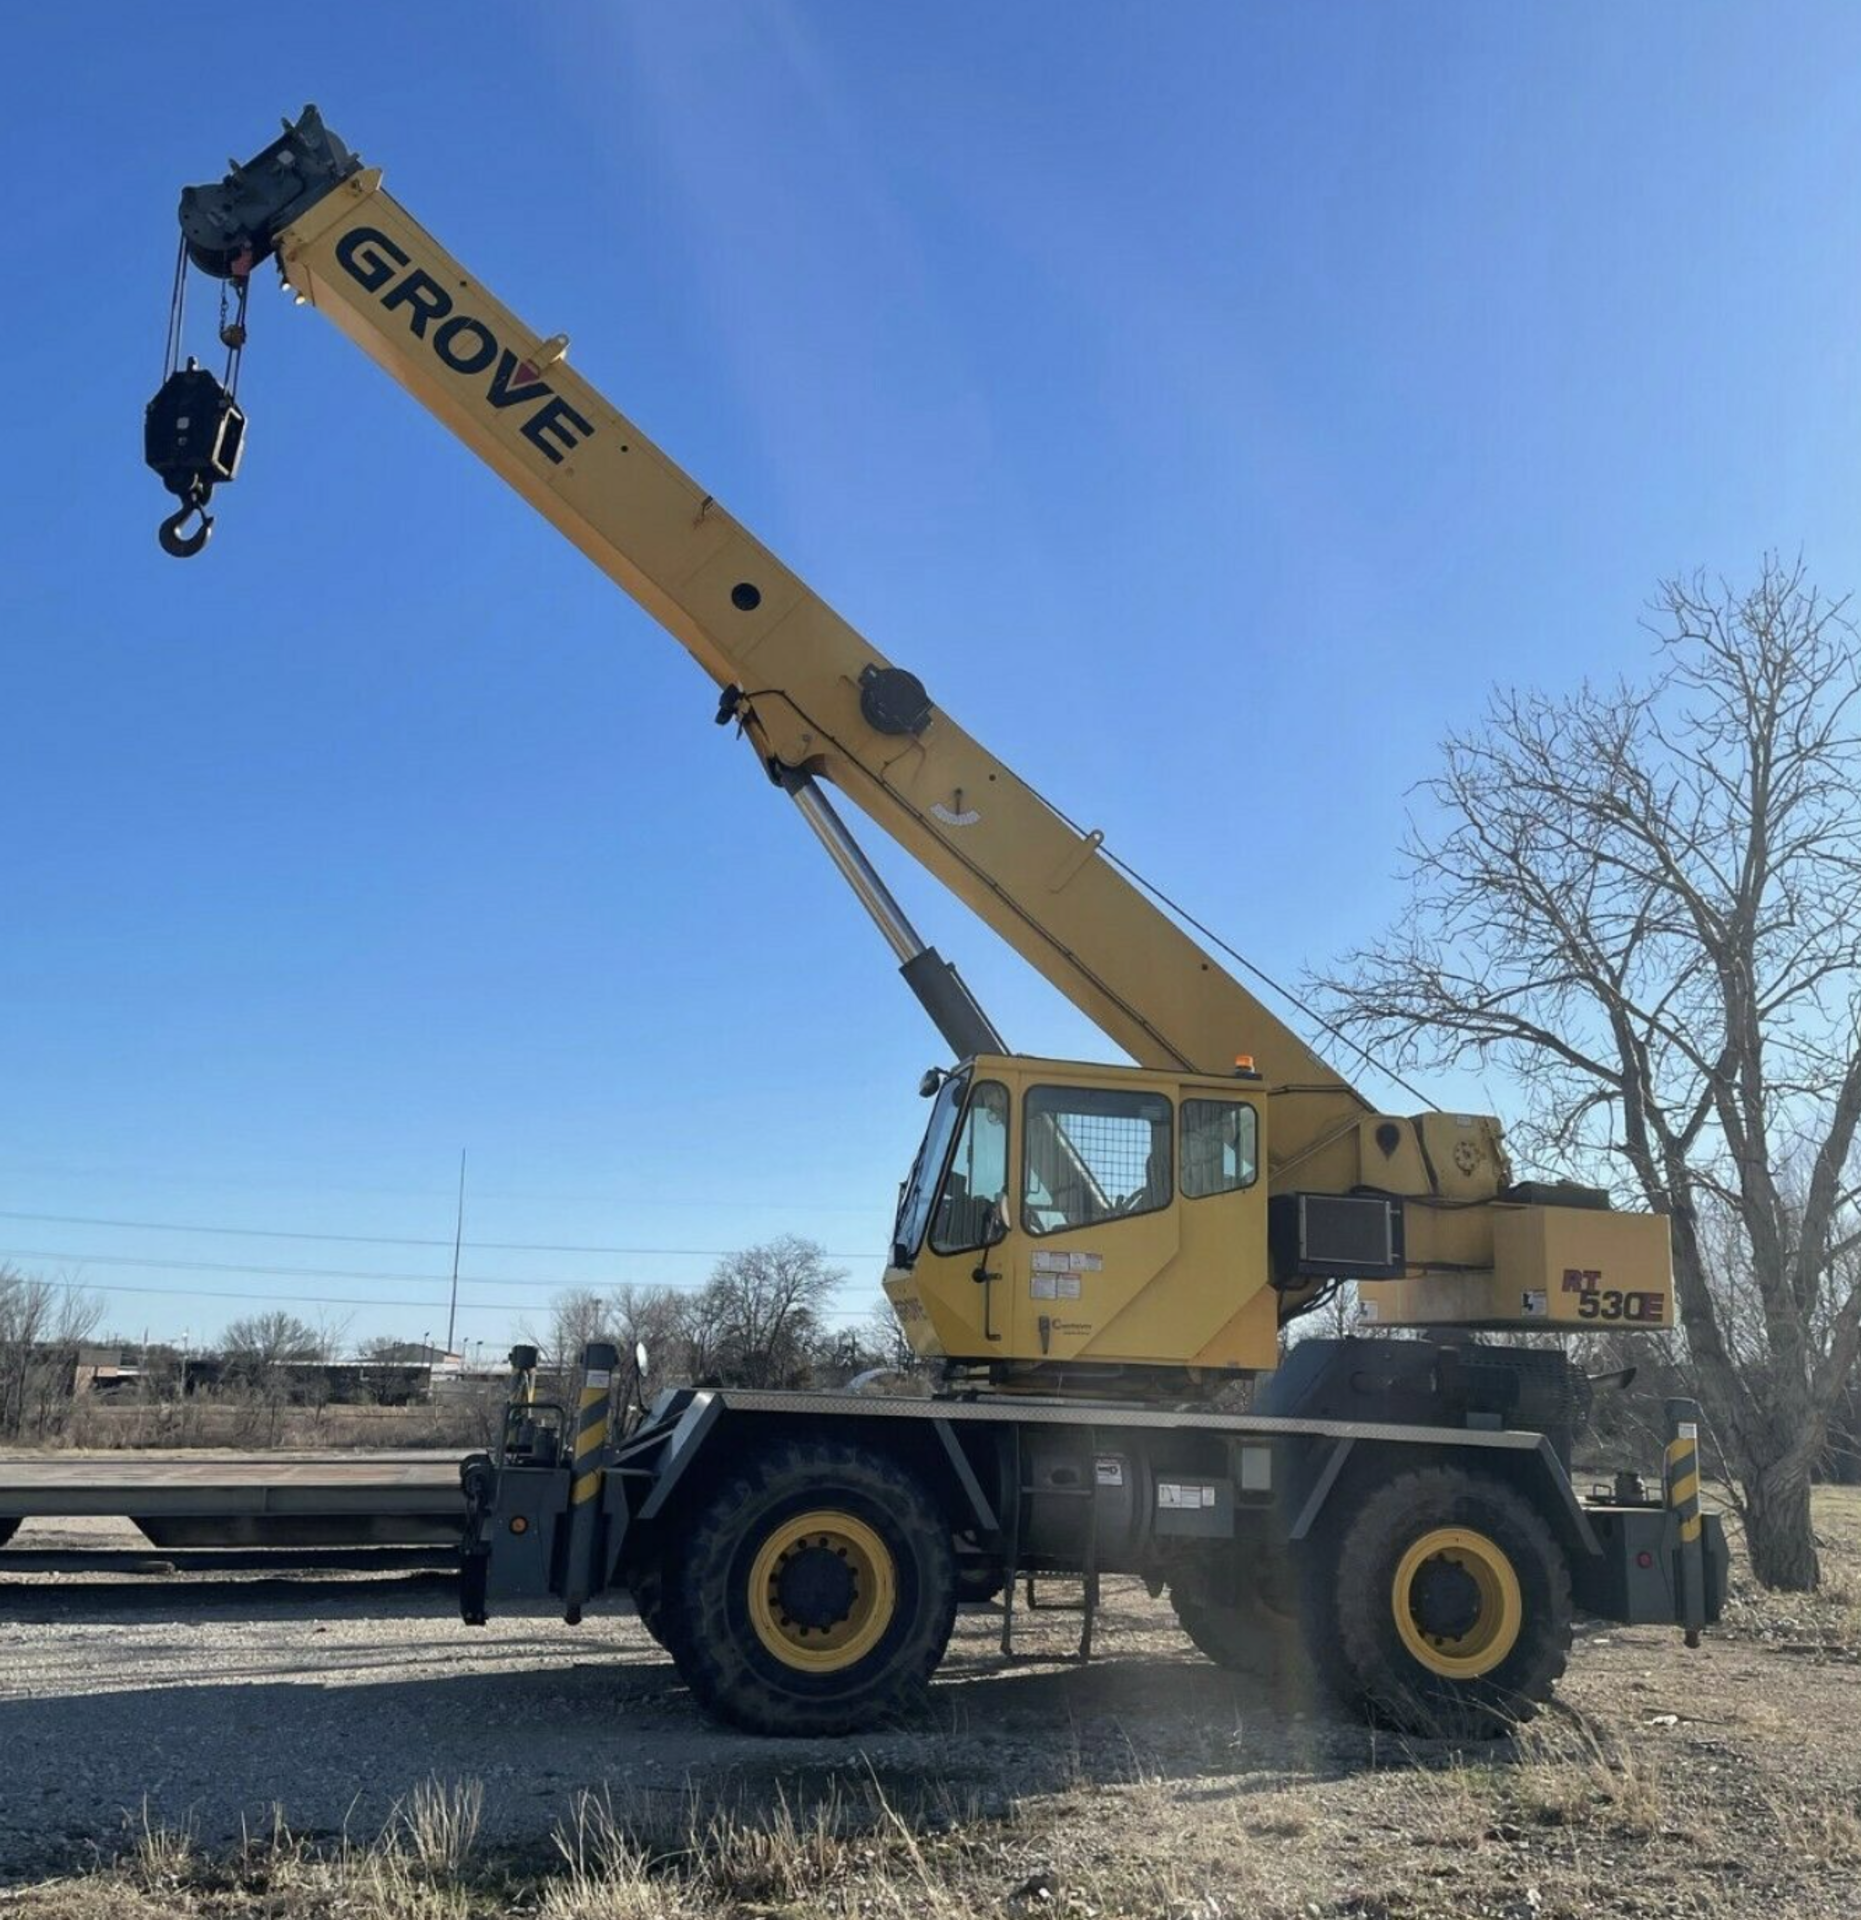 2006 Grove RT530E Crane, 30 Ton Capacity, (LOCATION: EULESS,TX)